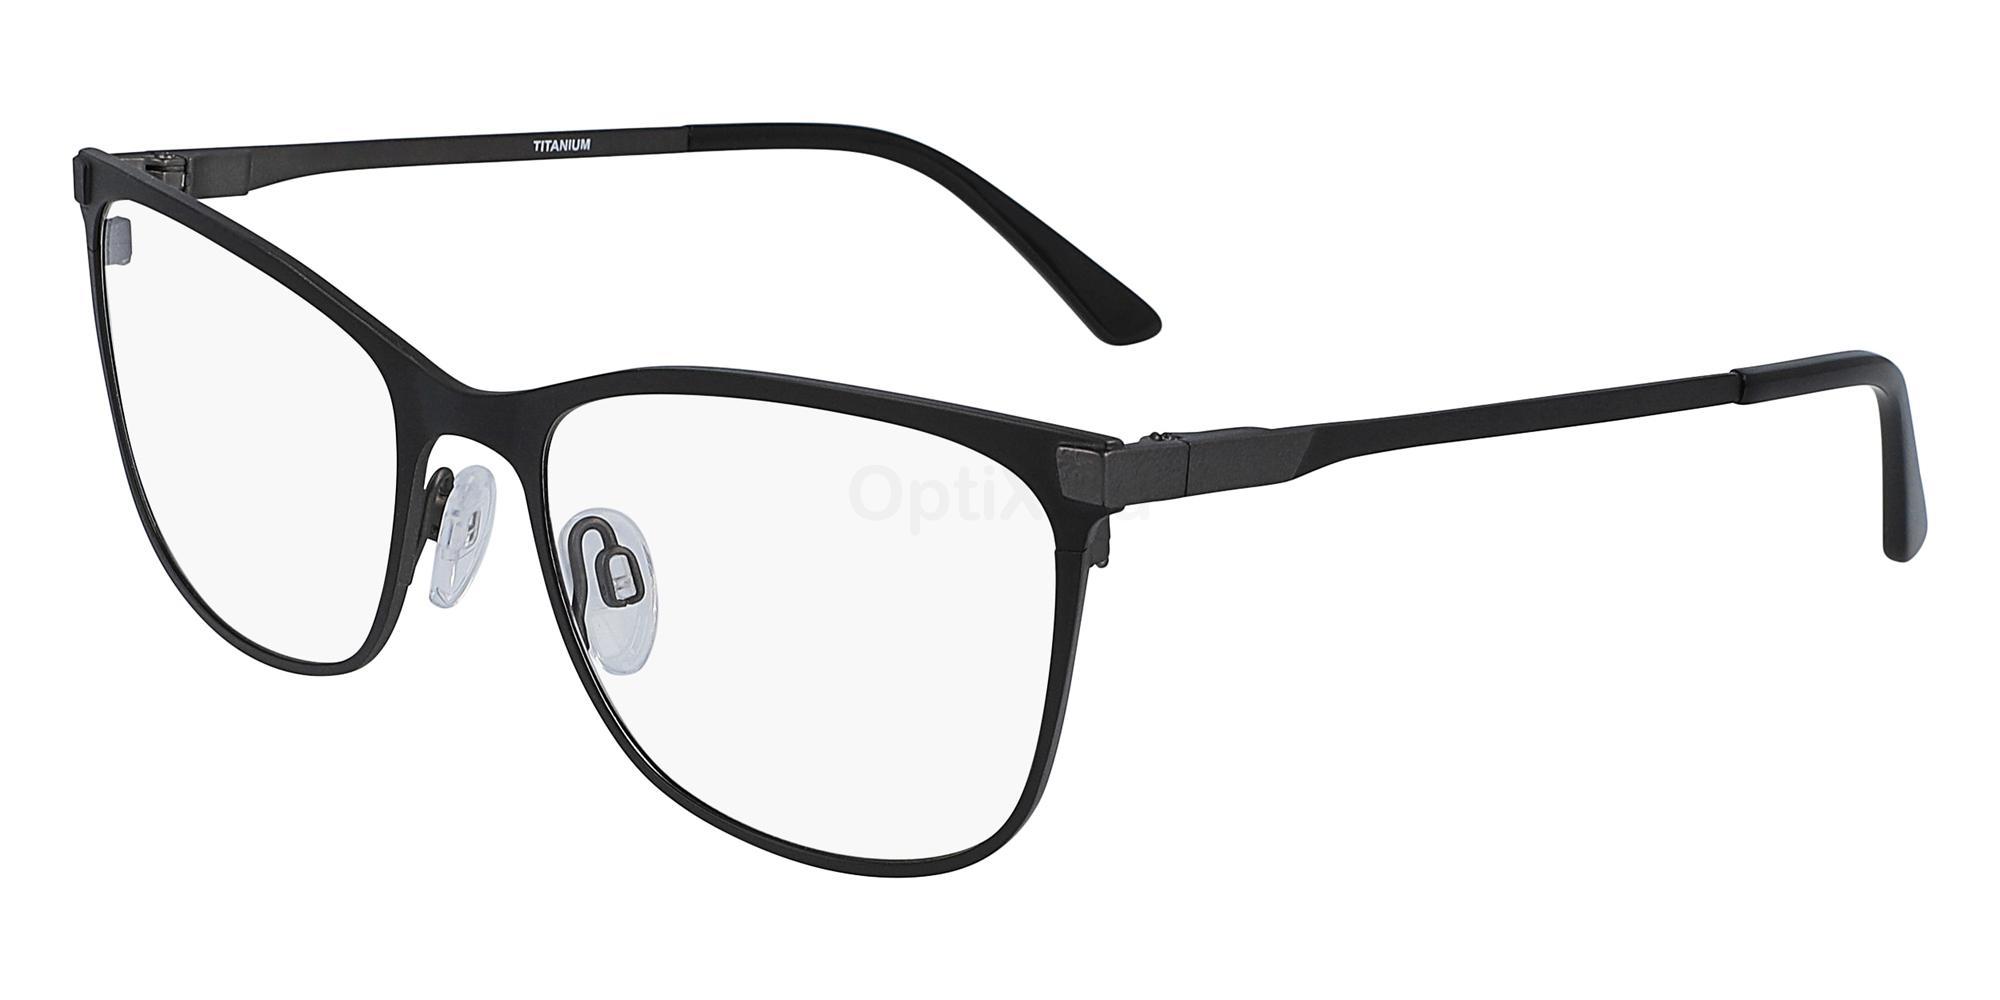 001 SK2830 TRADITION Glasses, Skaga